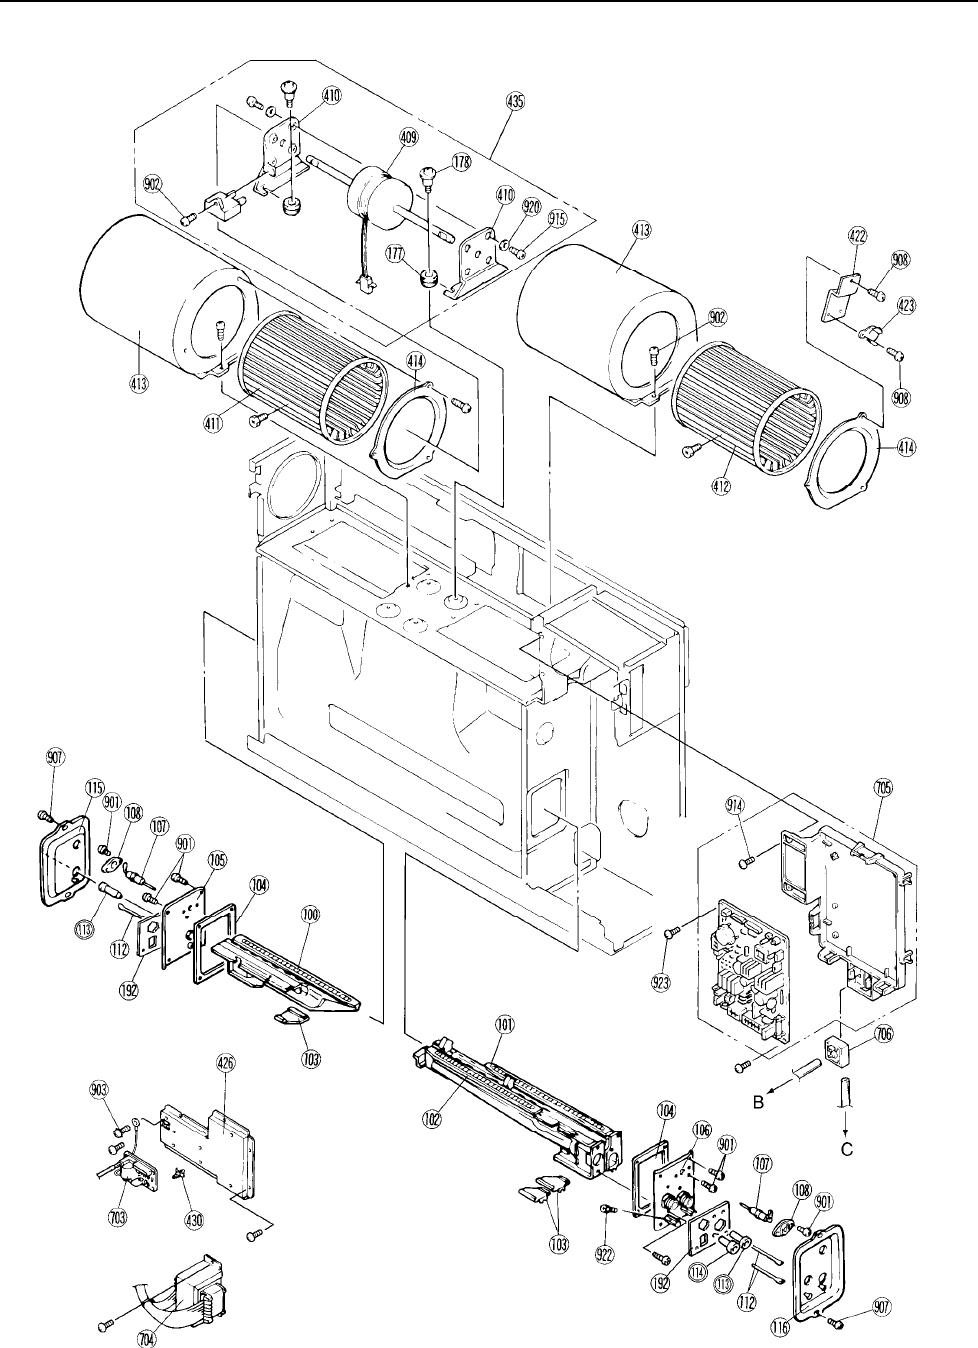 rinnai energysaver 557ftr user manual